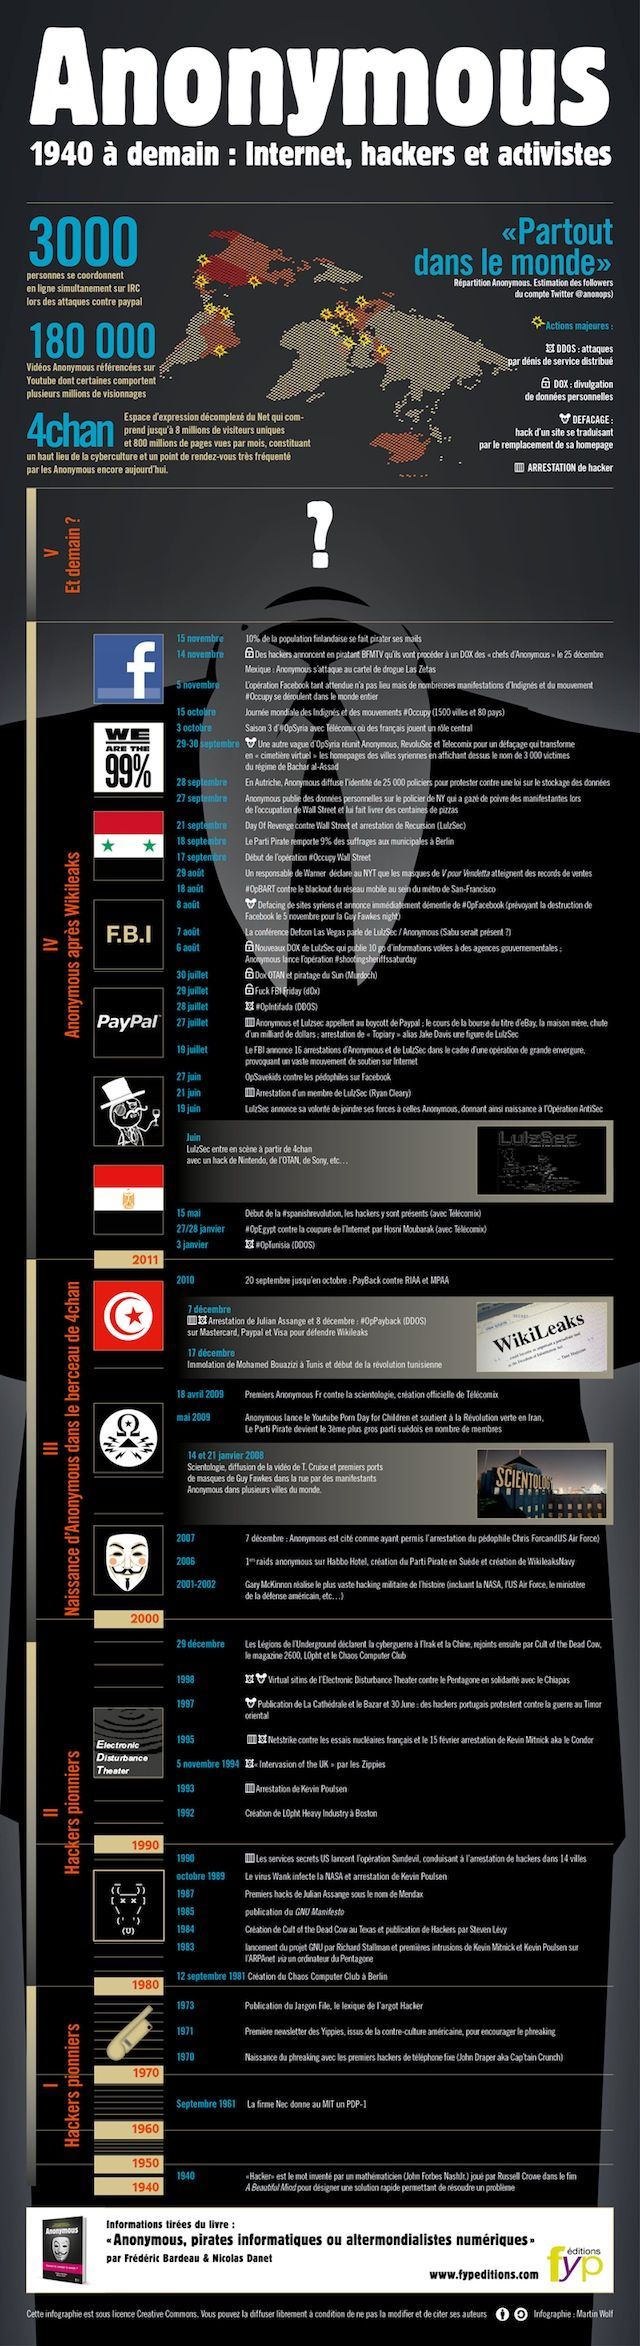 anonymous infographic